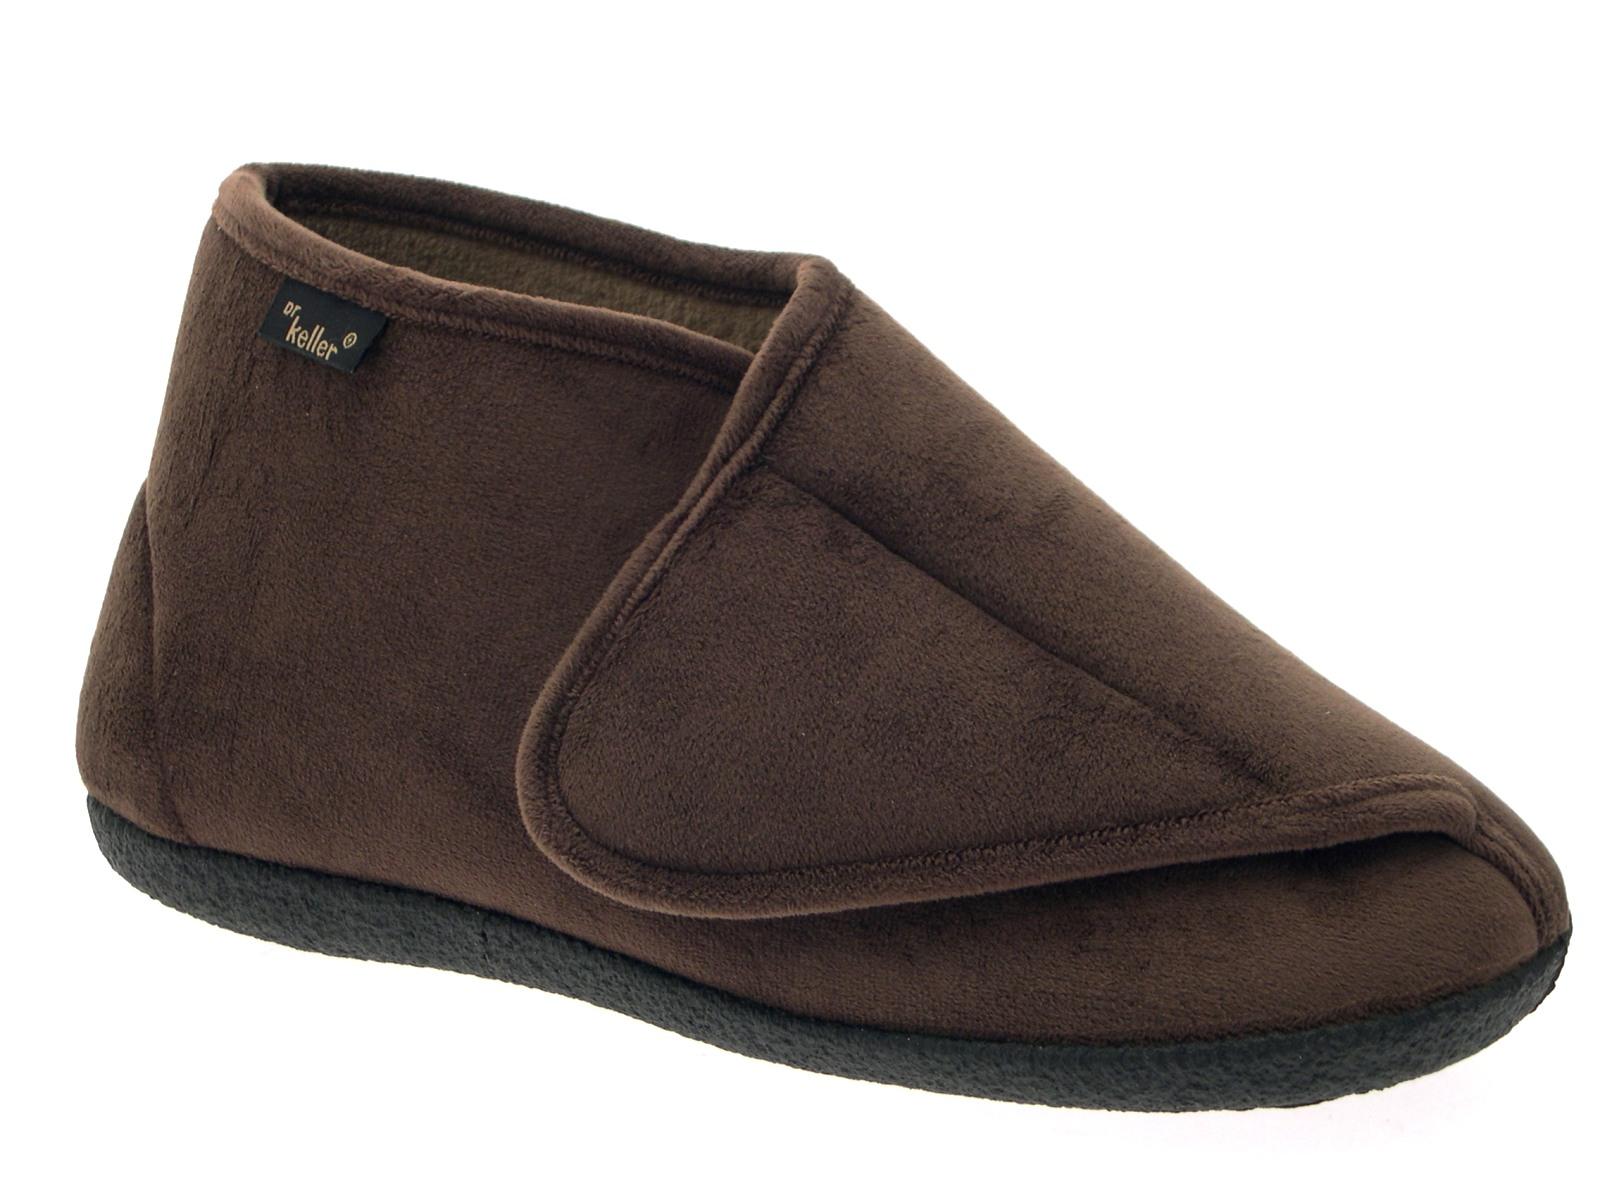 mens diabetic orthopaedic comfort slippers boot wide